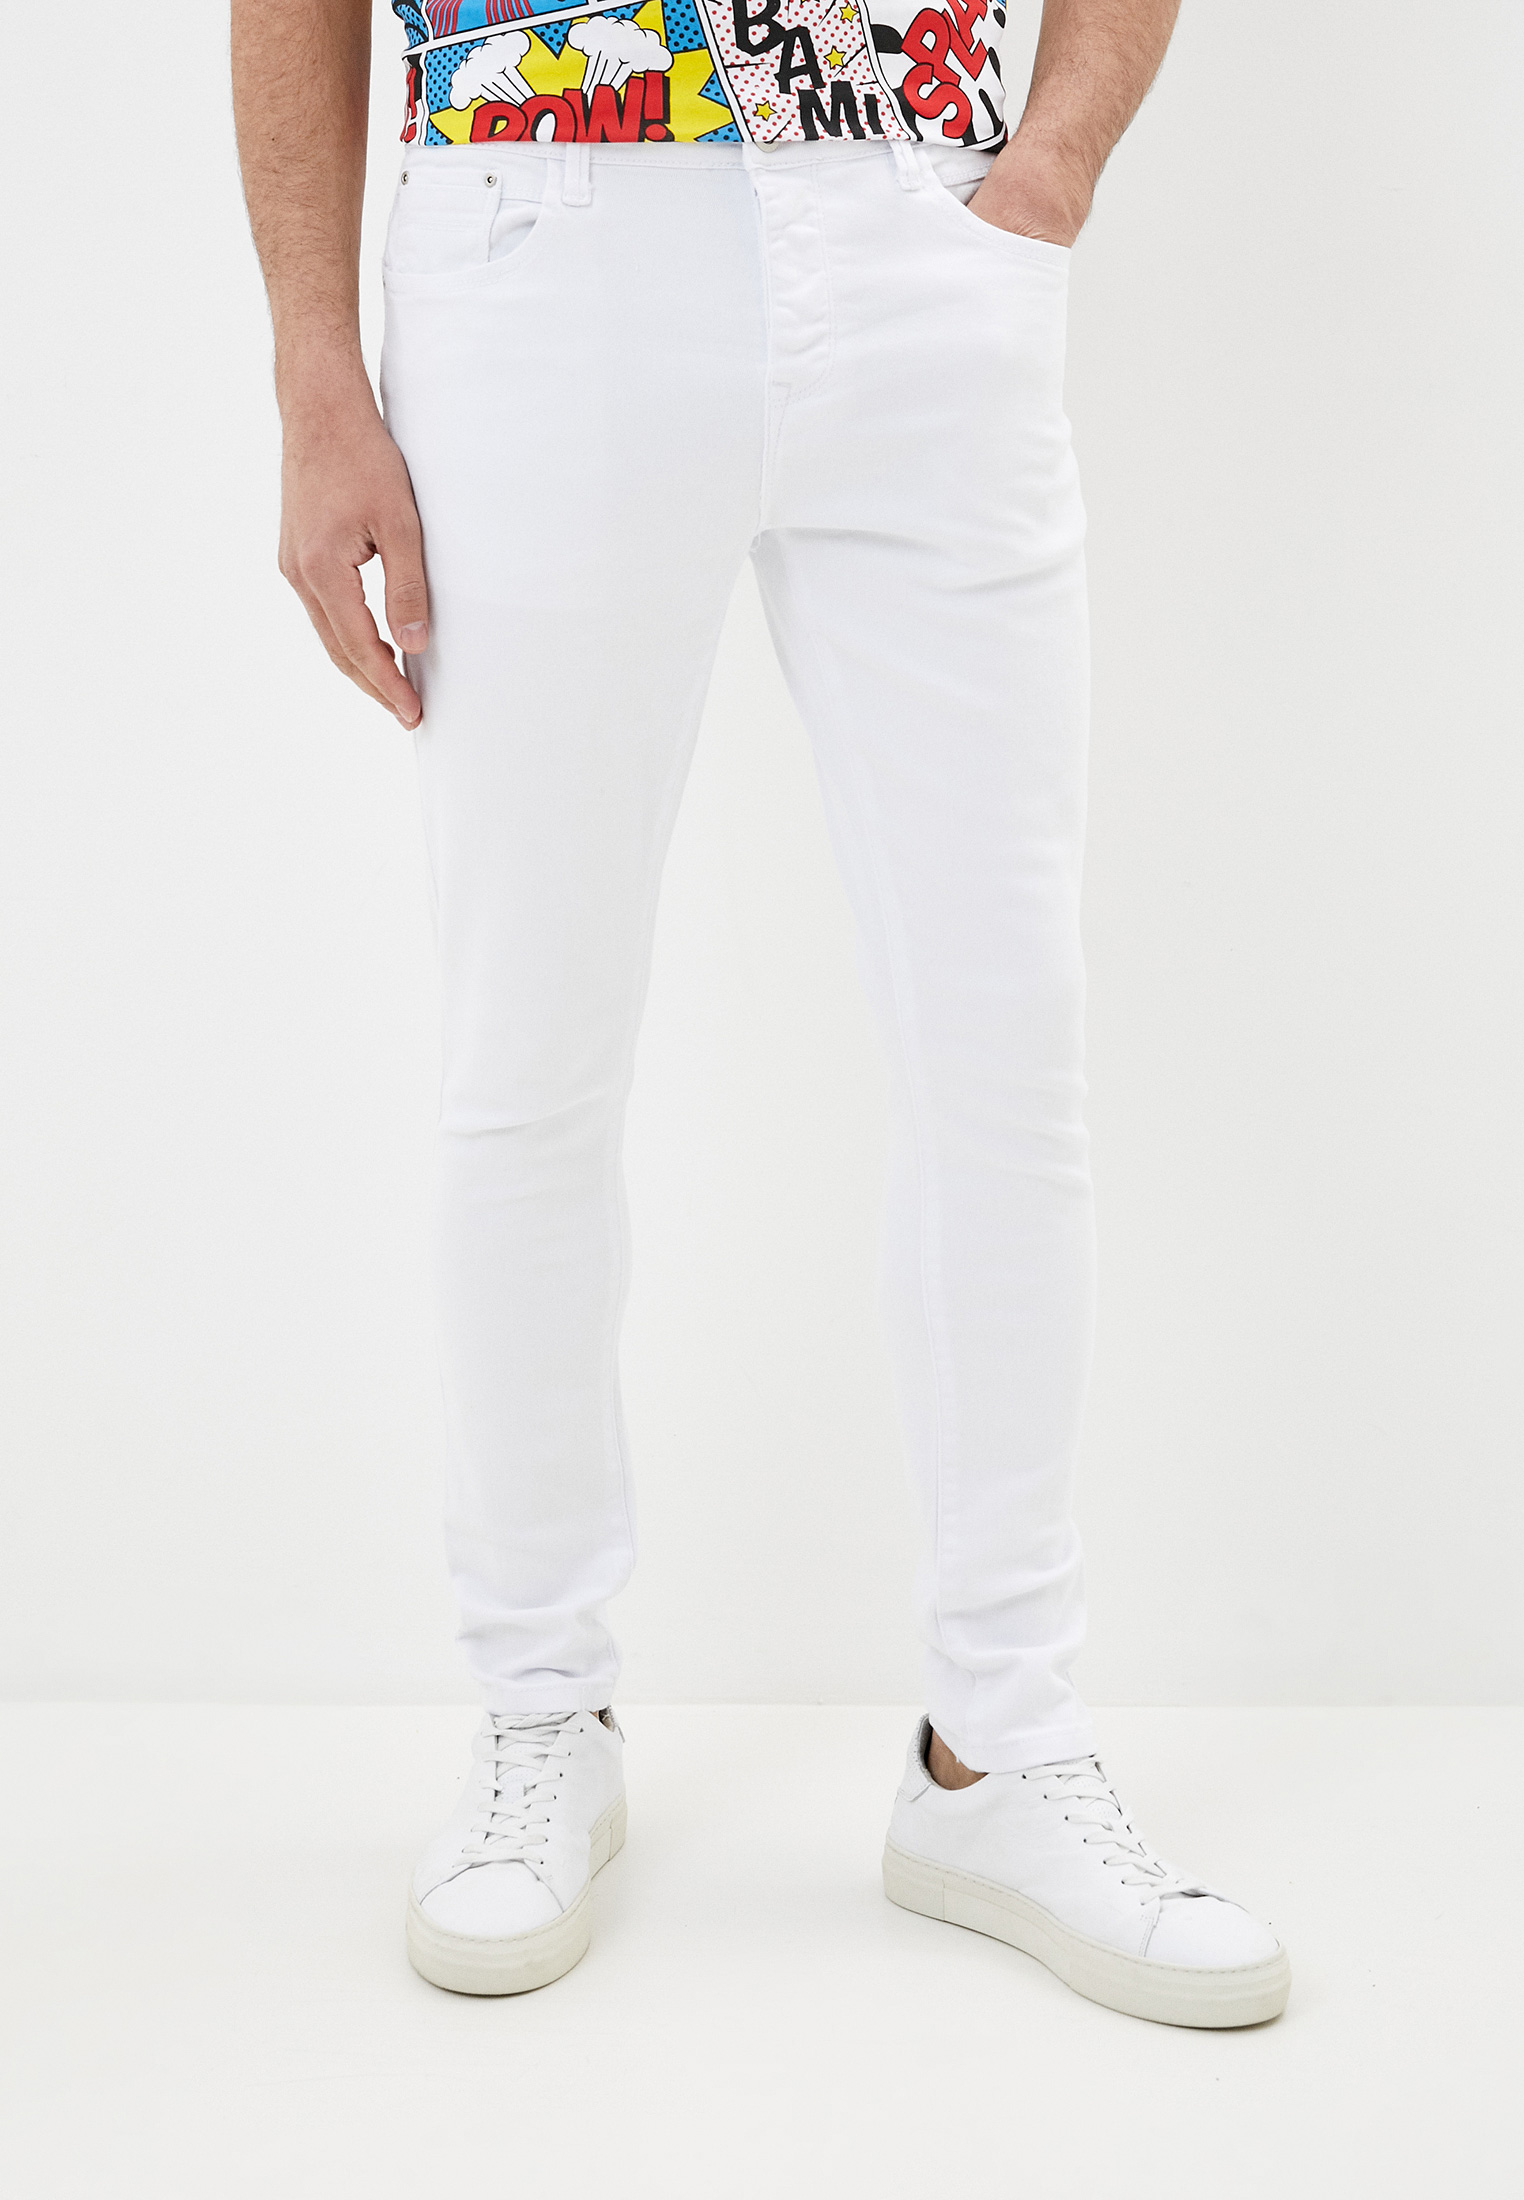 Зауженные джинсы Terance Kole 72295